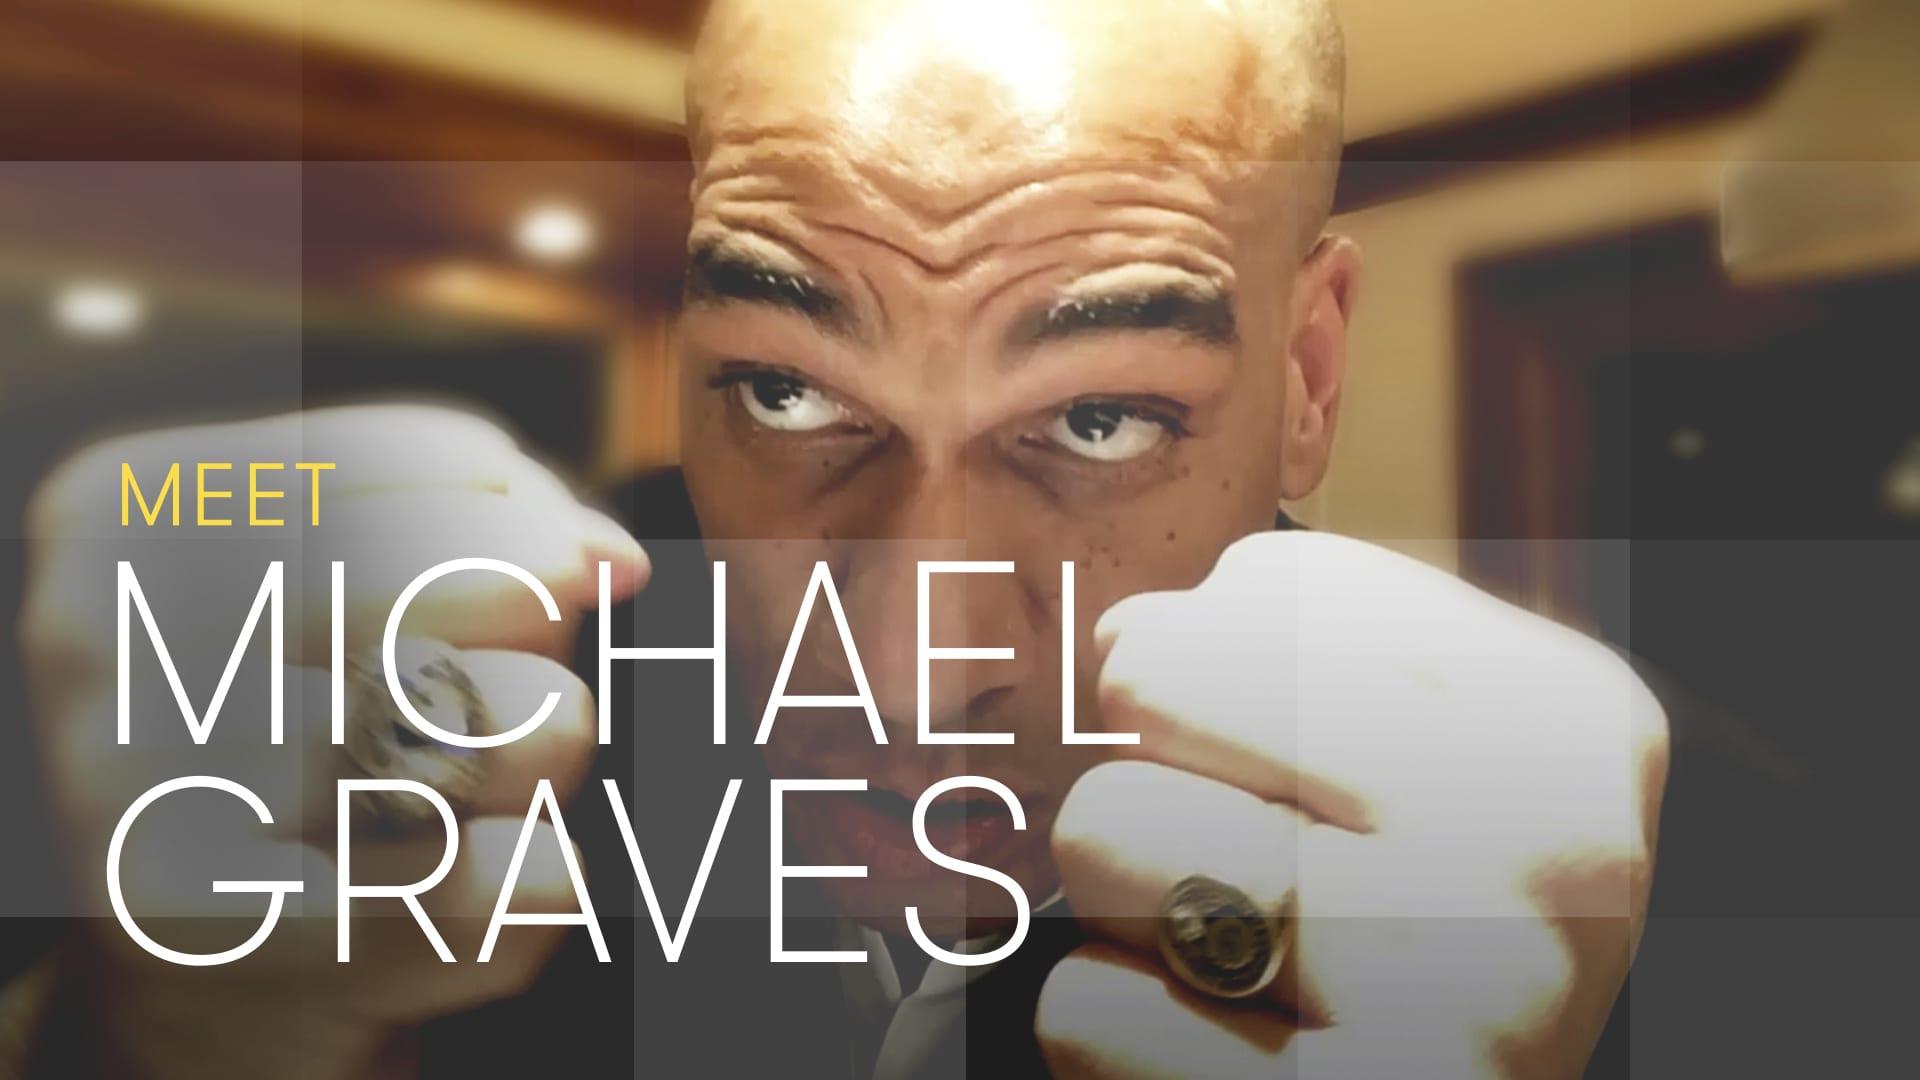 The Partner contestant Michael Graves